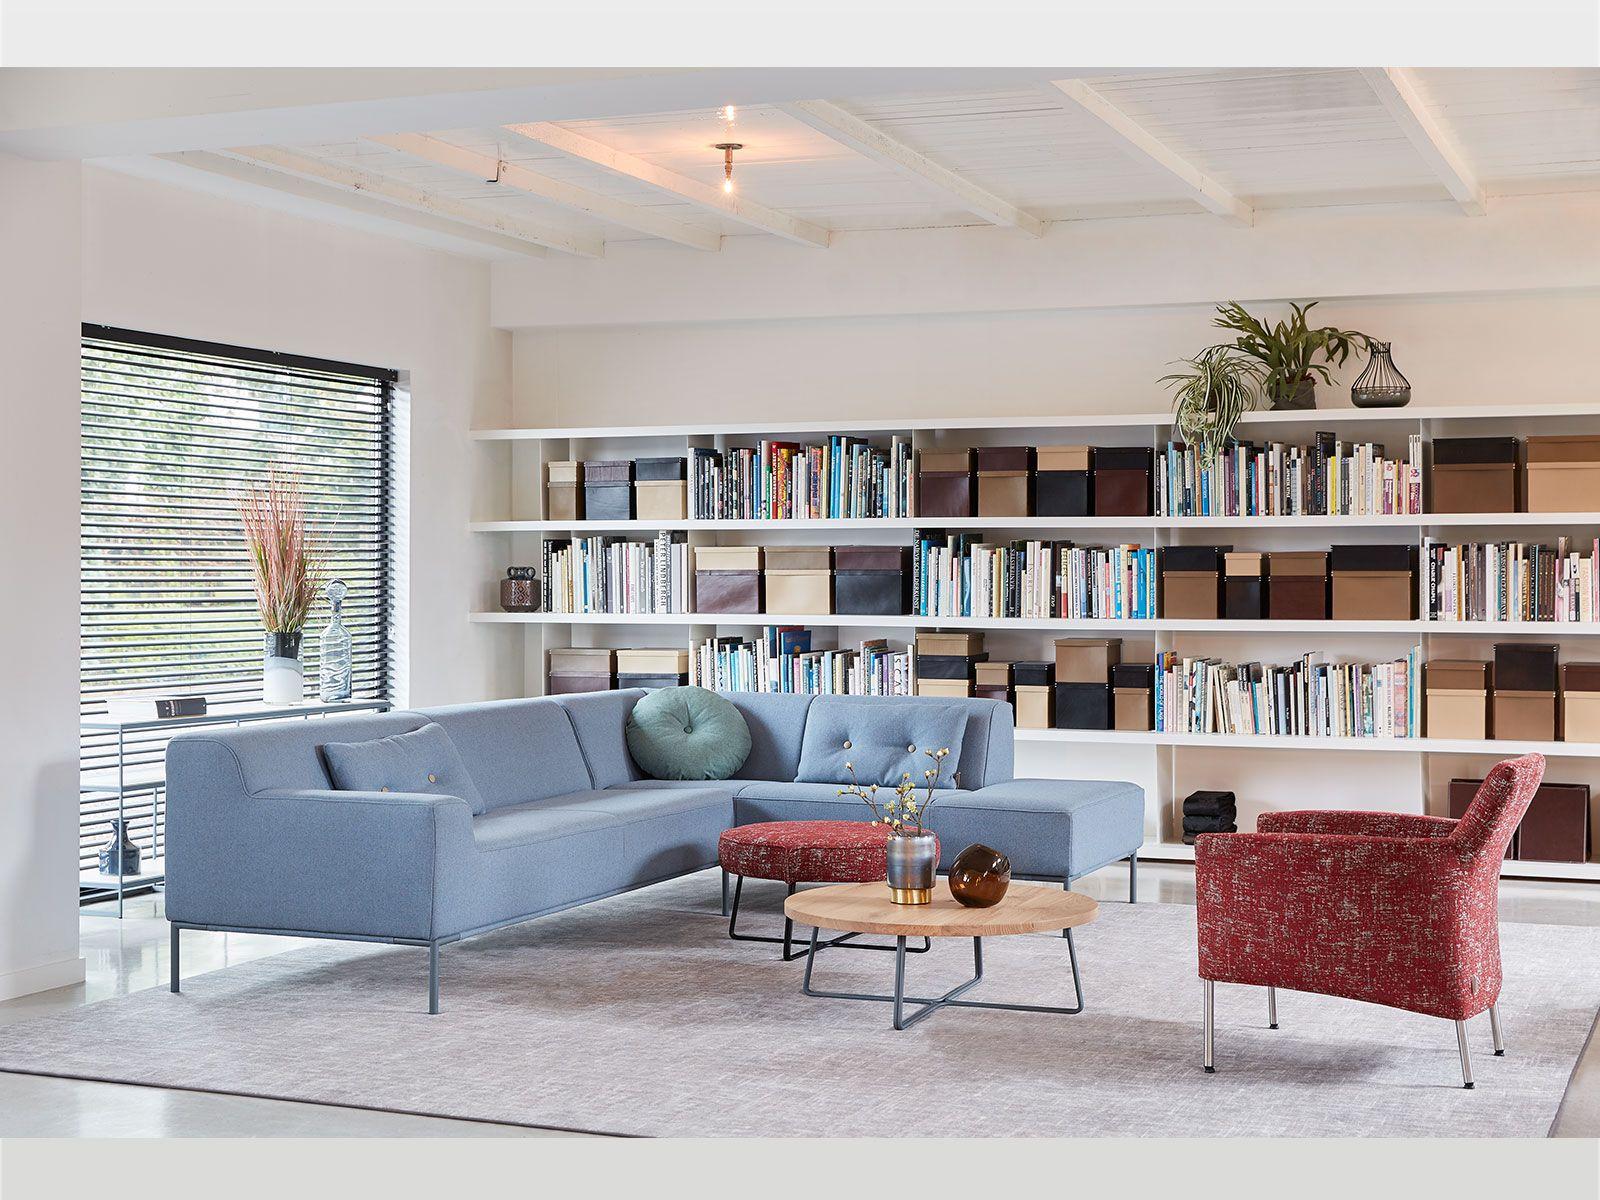 Design Meubels Banken.Bertplantagie Bert Plantagie Furniture Ryke Bank Ryke